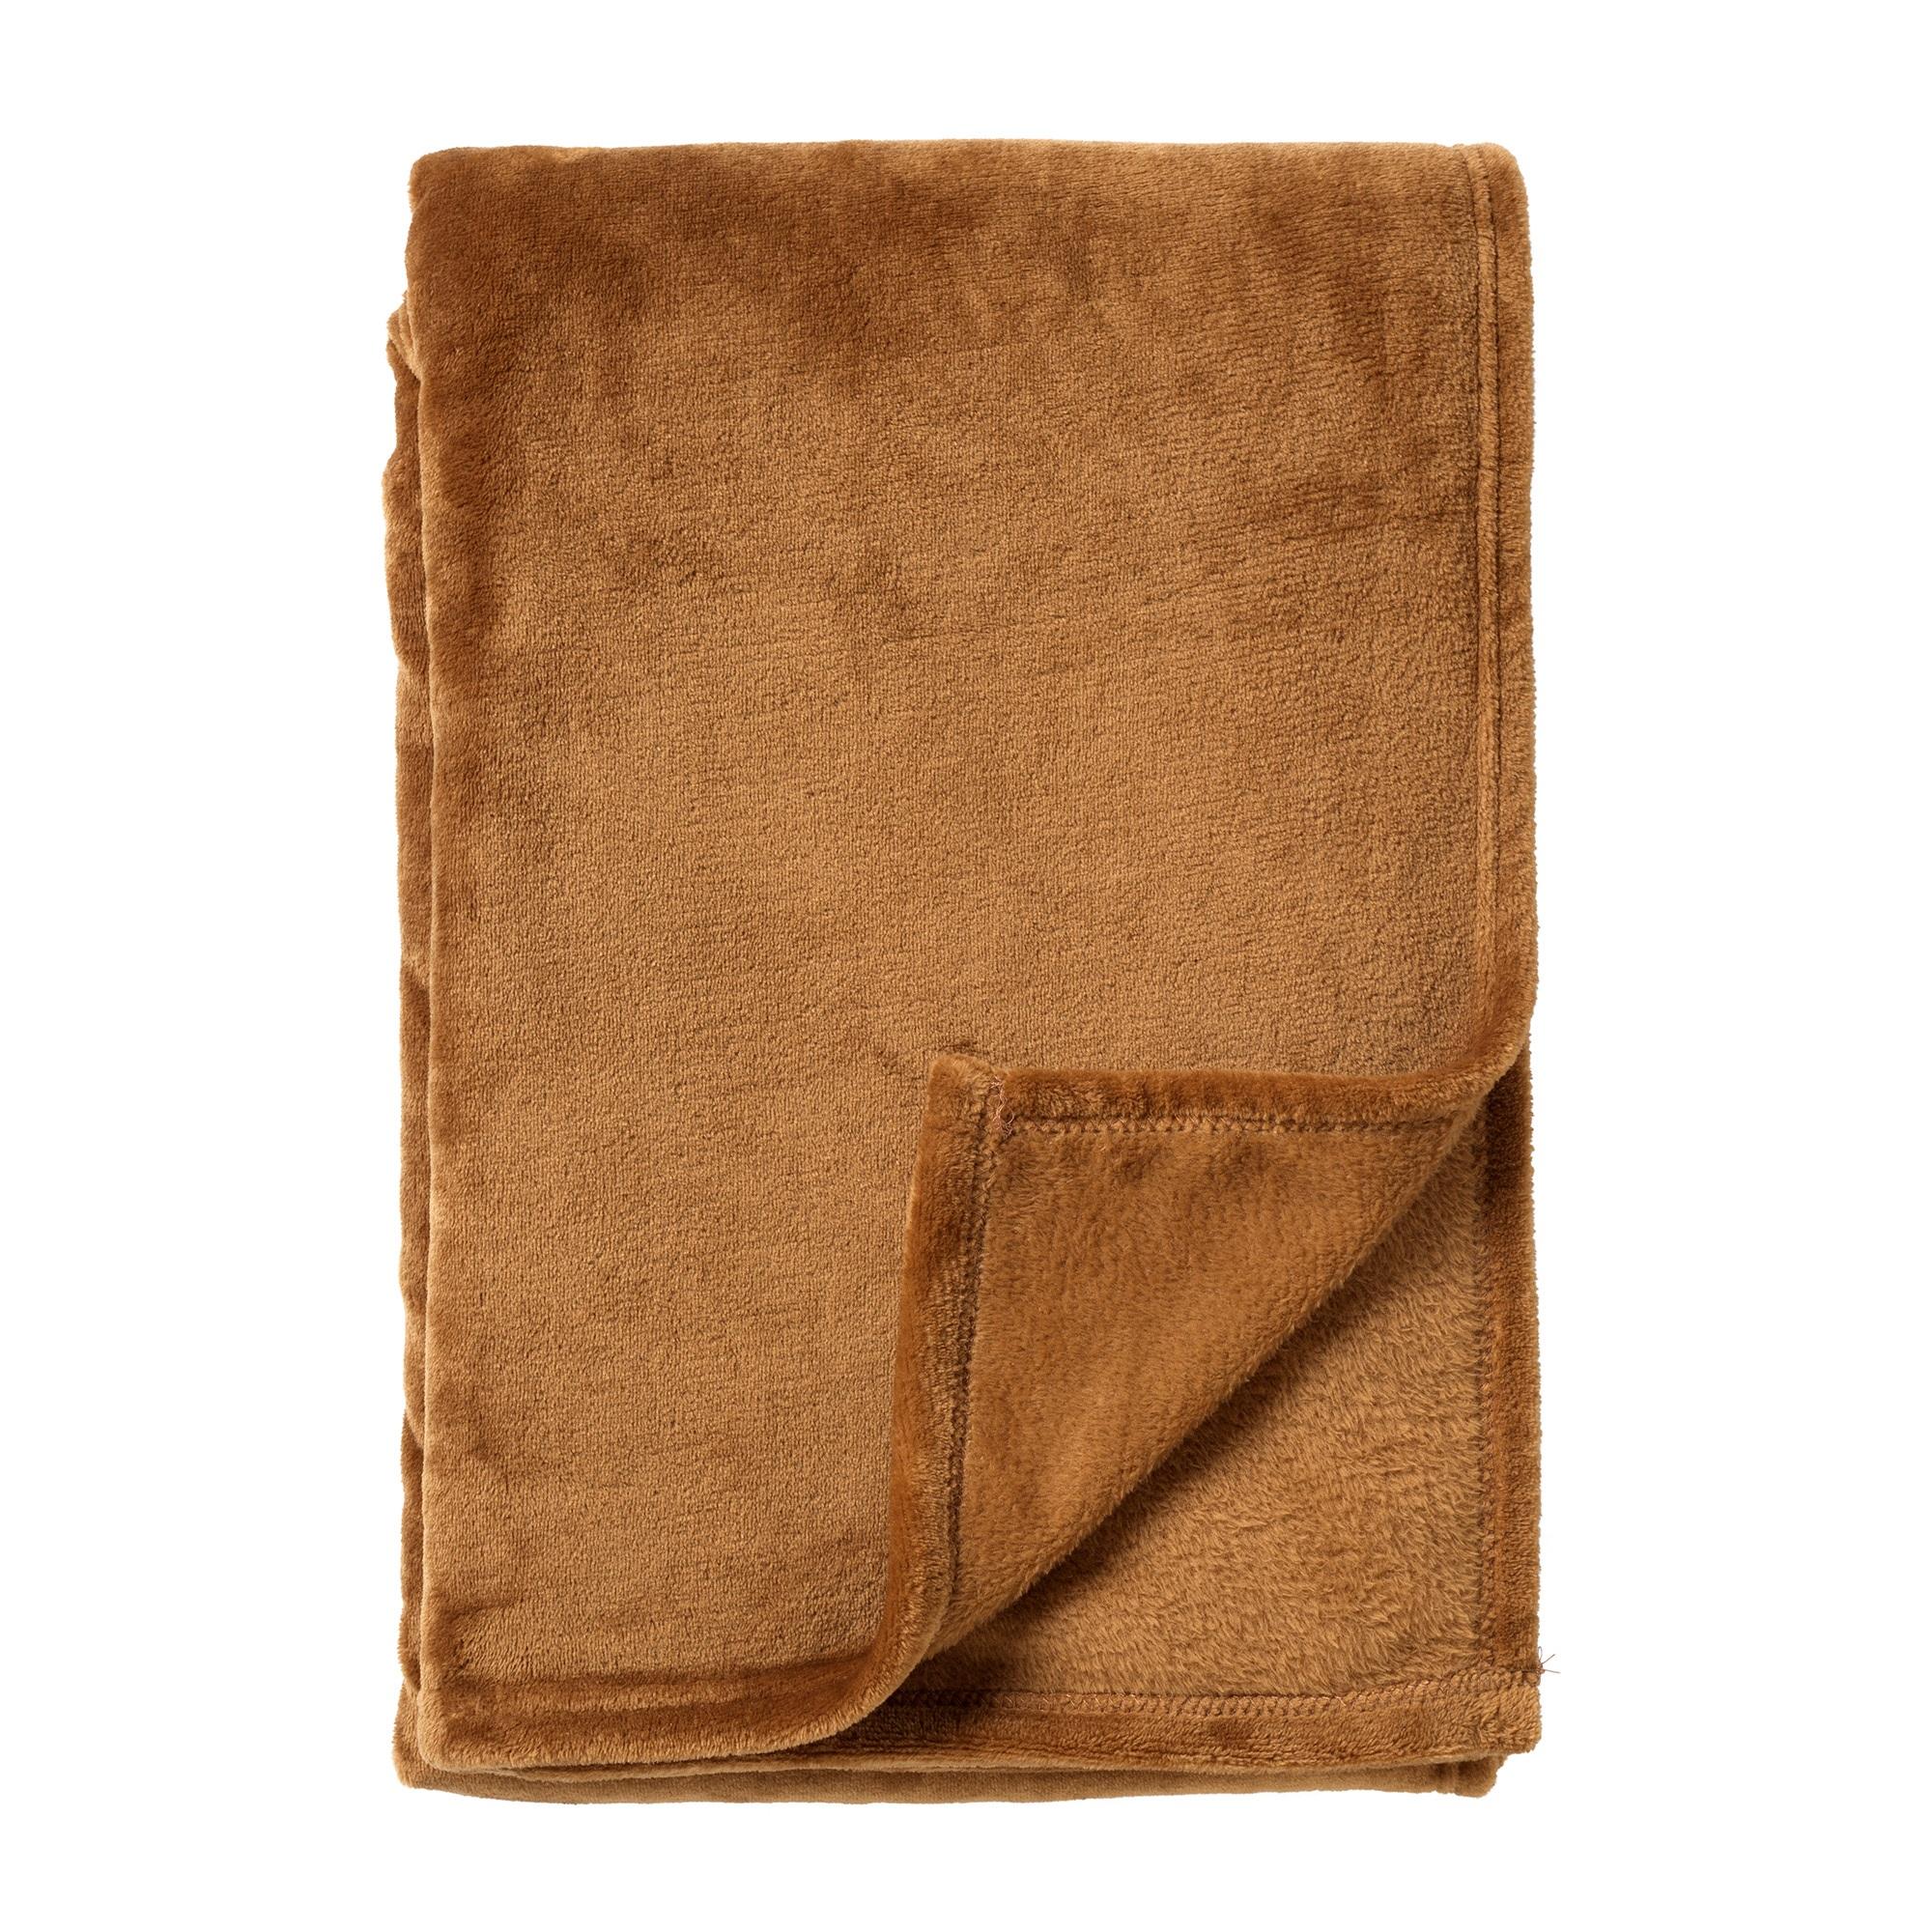 HARVEY - Plaid van fleece Tobacco Brown 150x200 cm